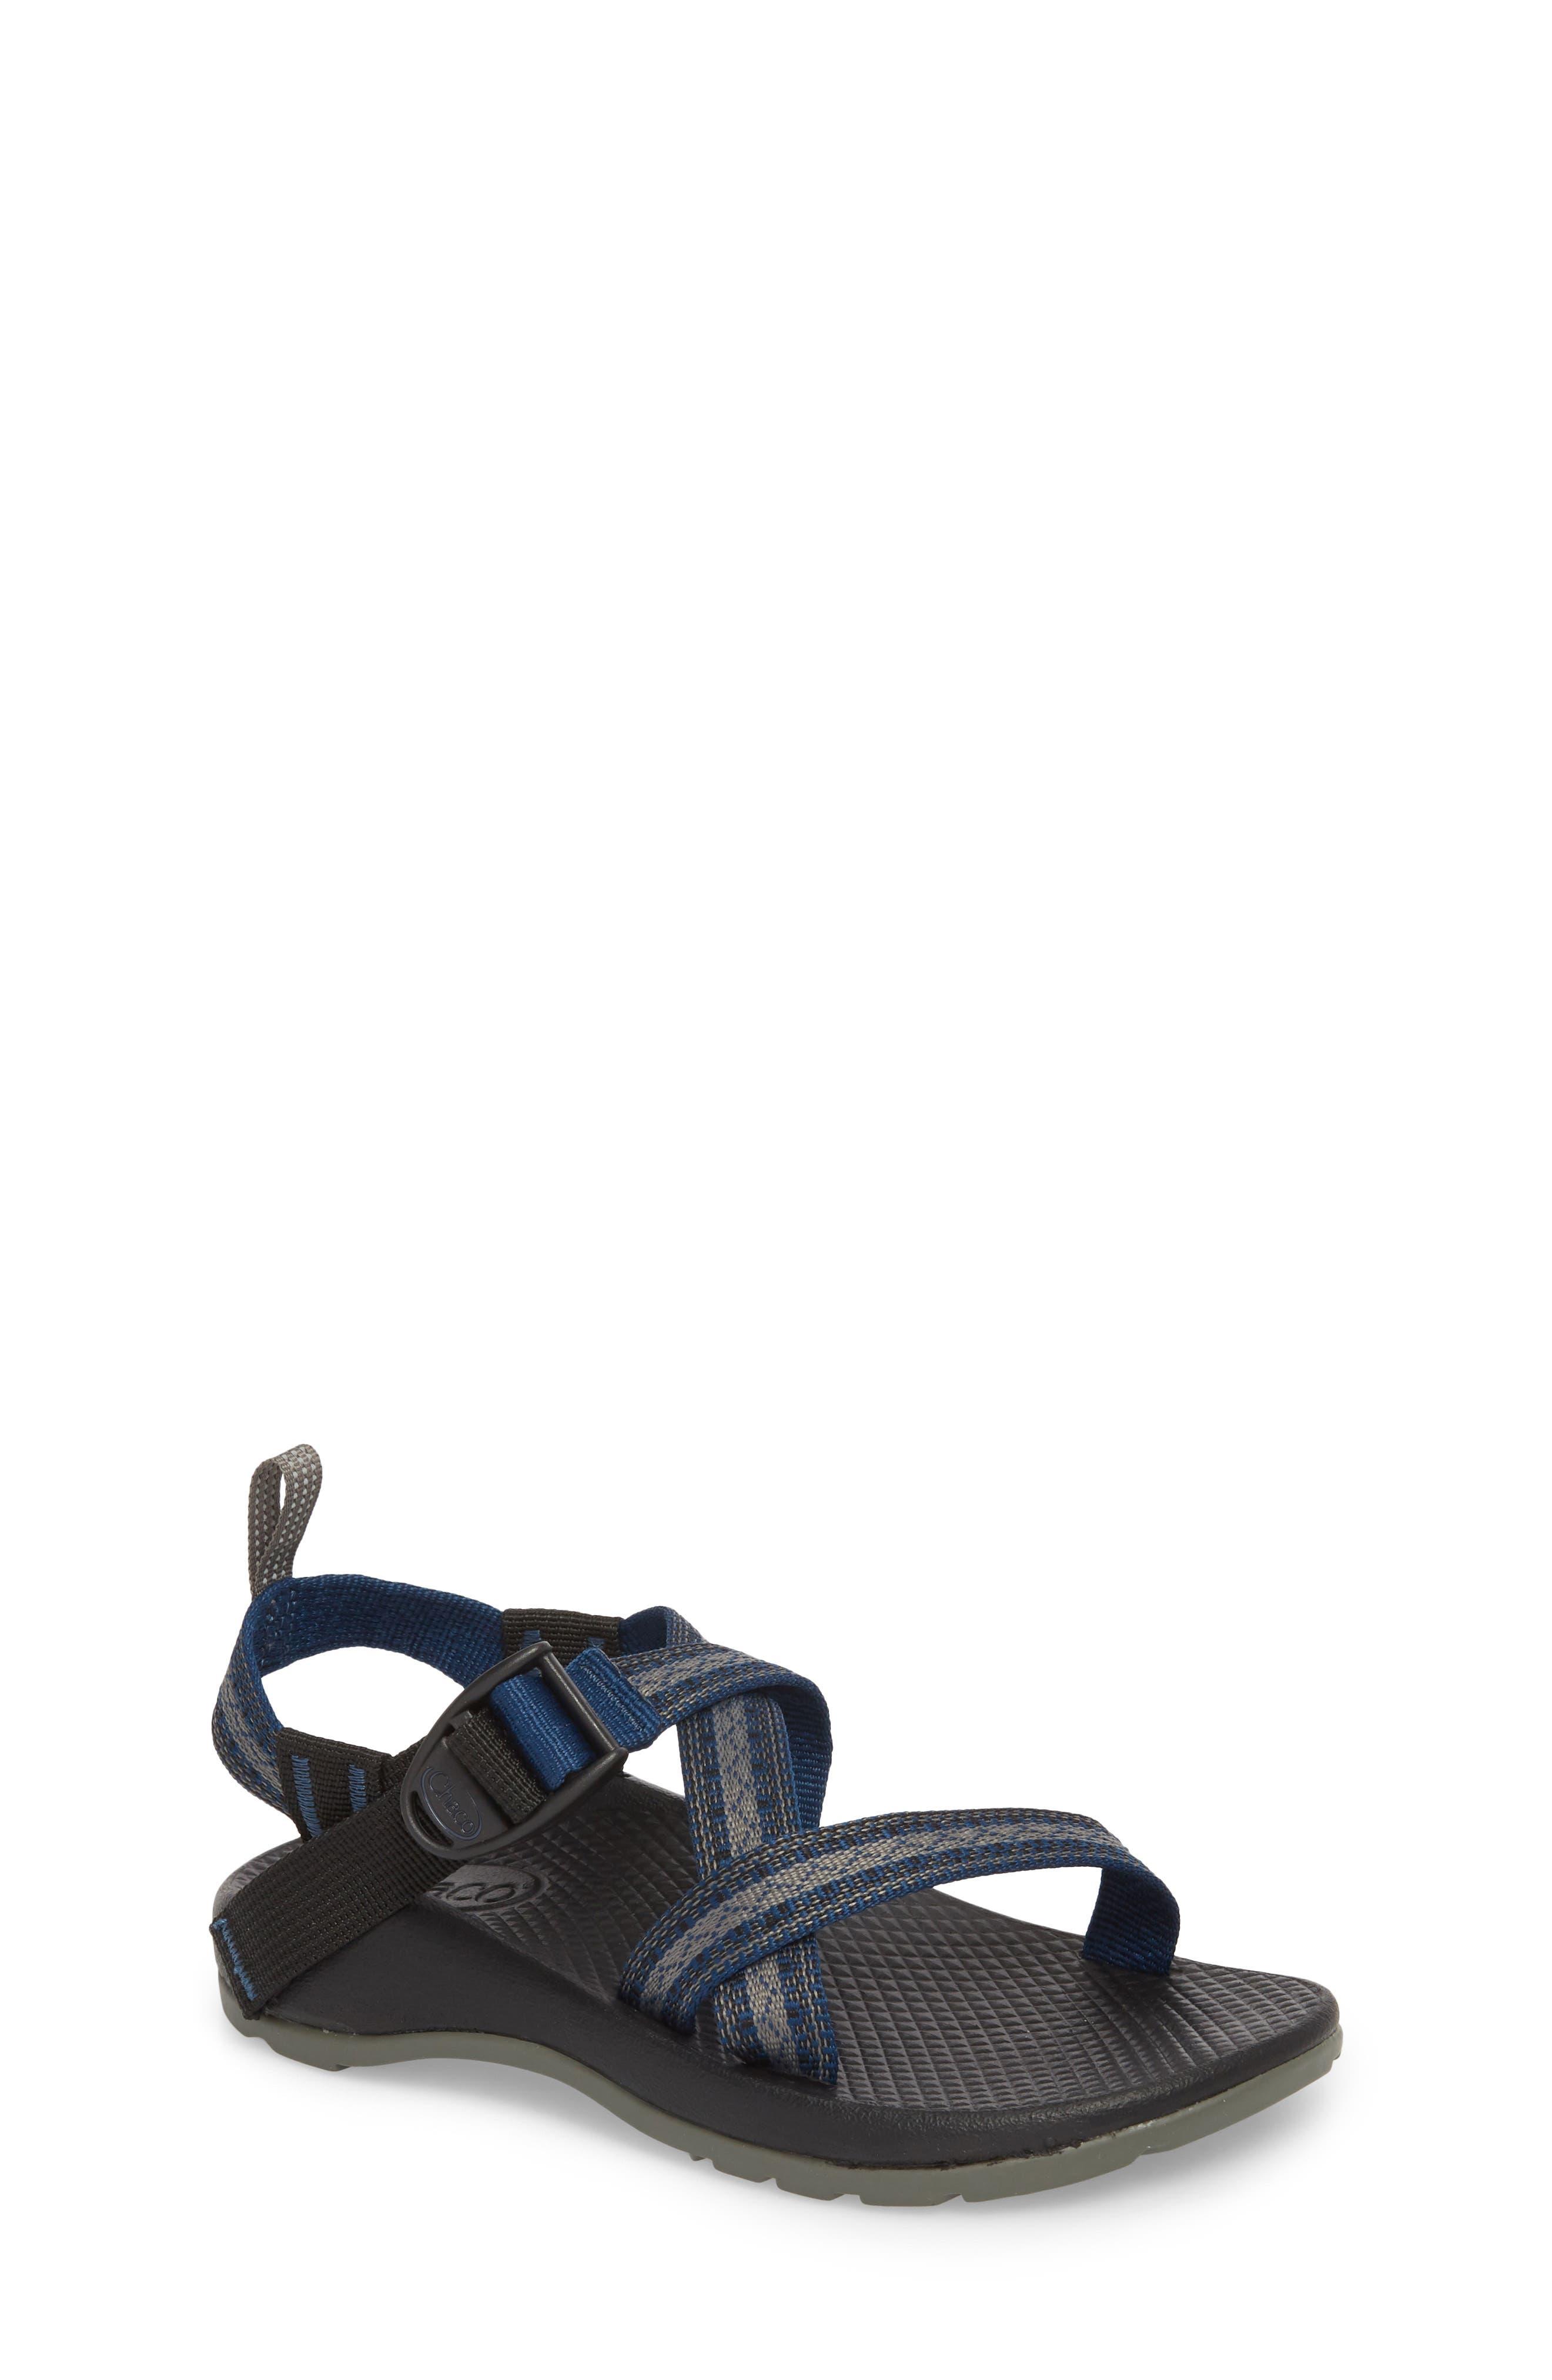 Z/1 Sport Sandal,                             Main thumbnail 1, color,                             STAKES